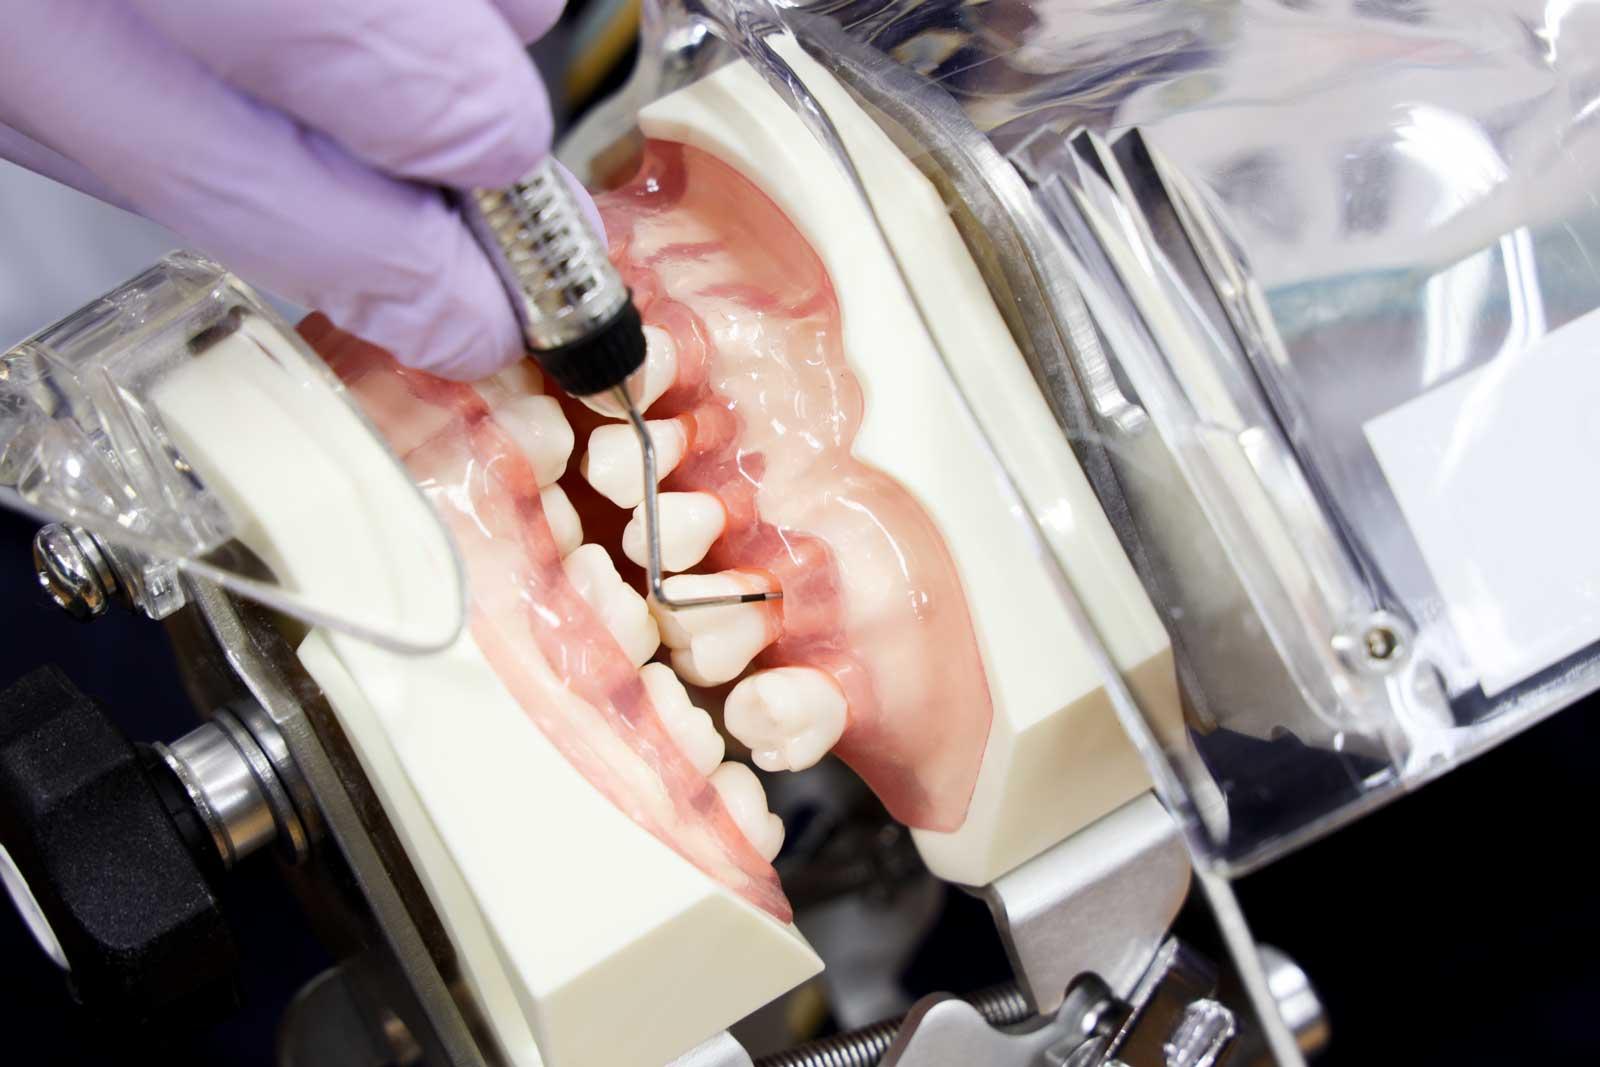 歯科衛生士養成コース_実習風景1アップ